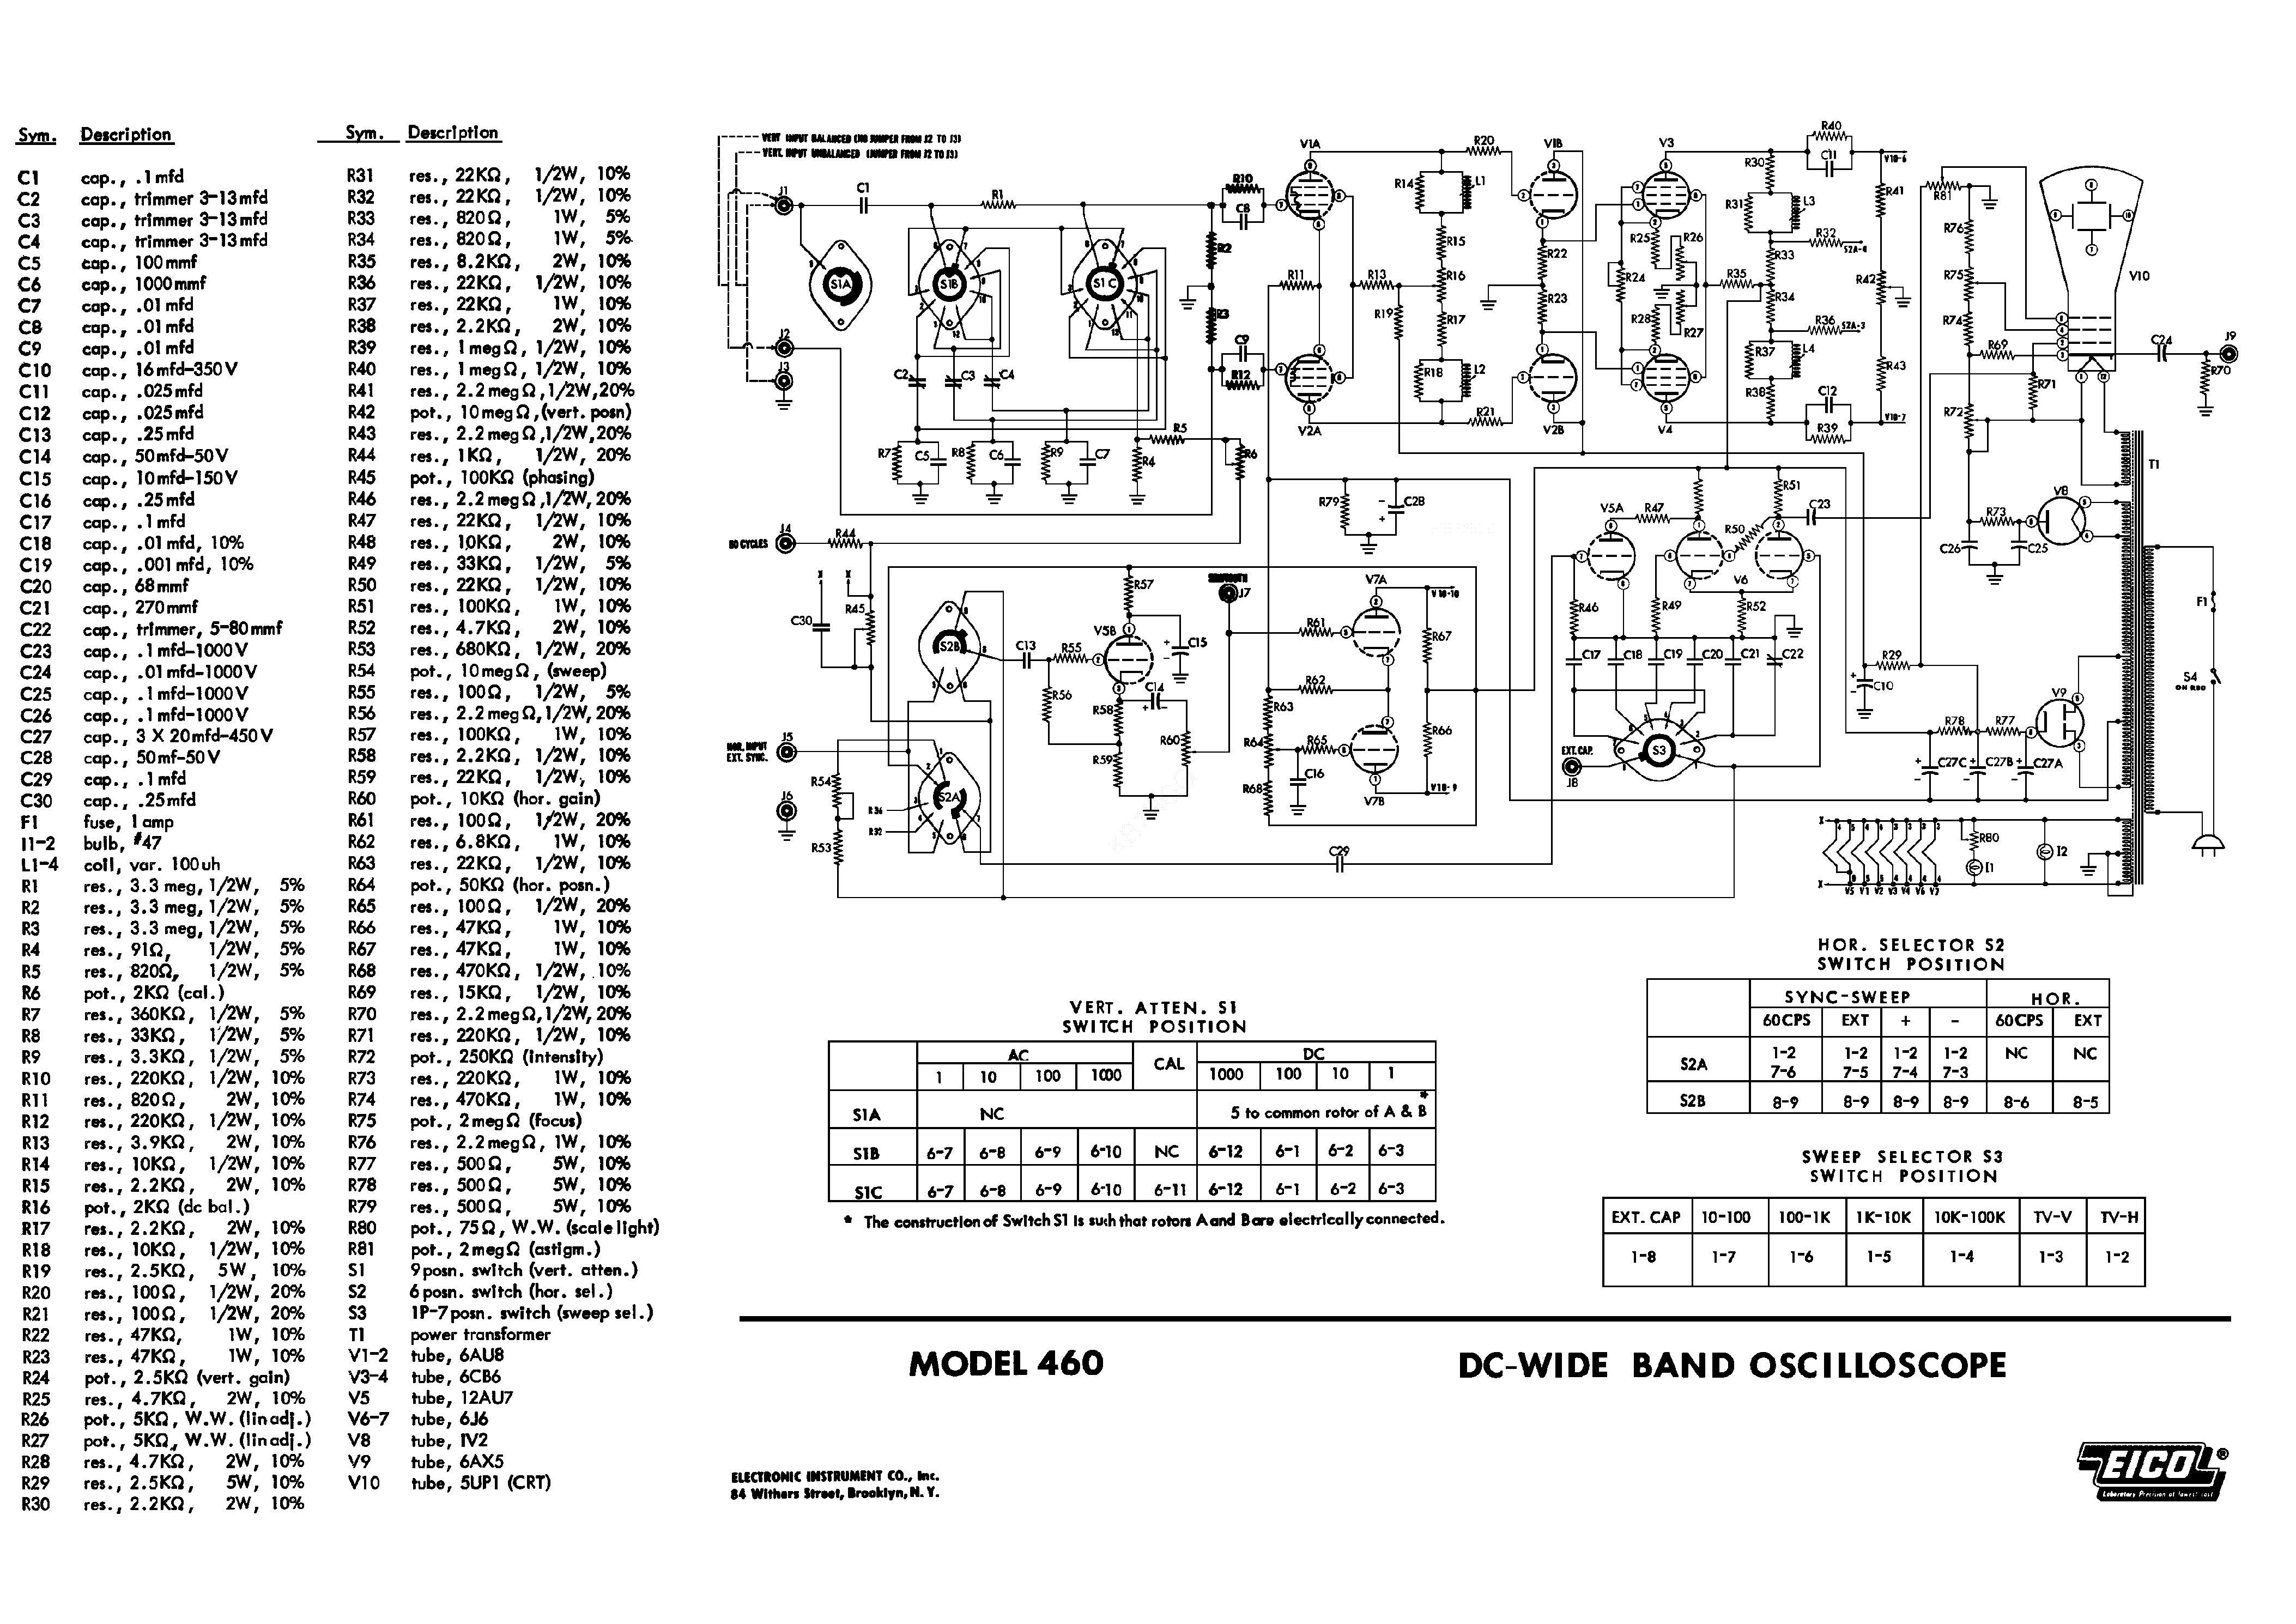 eico 460 parts sch service manual download schematics eeprom rh elektrotanya com PC-based Oscilloscope Kit Multimeter Schematic 77